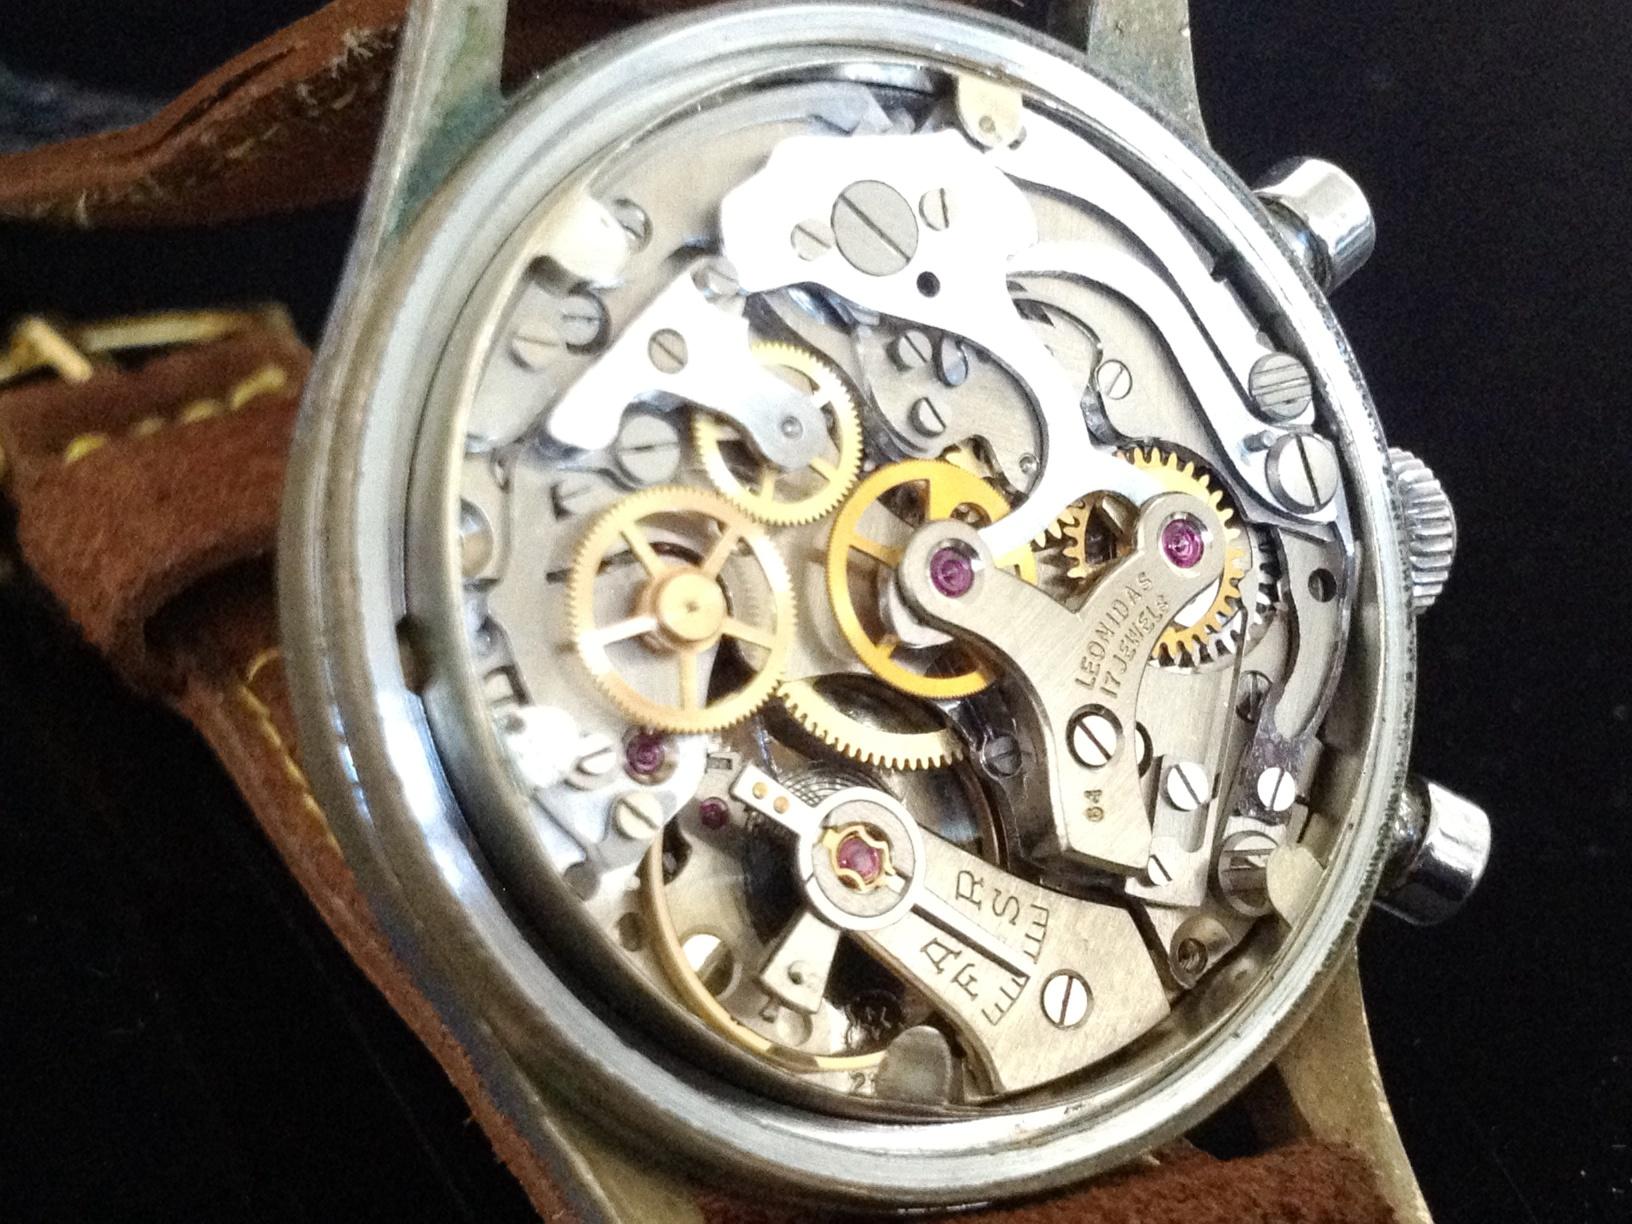 Leonidas Chronograph 150